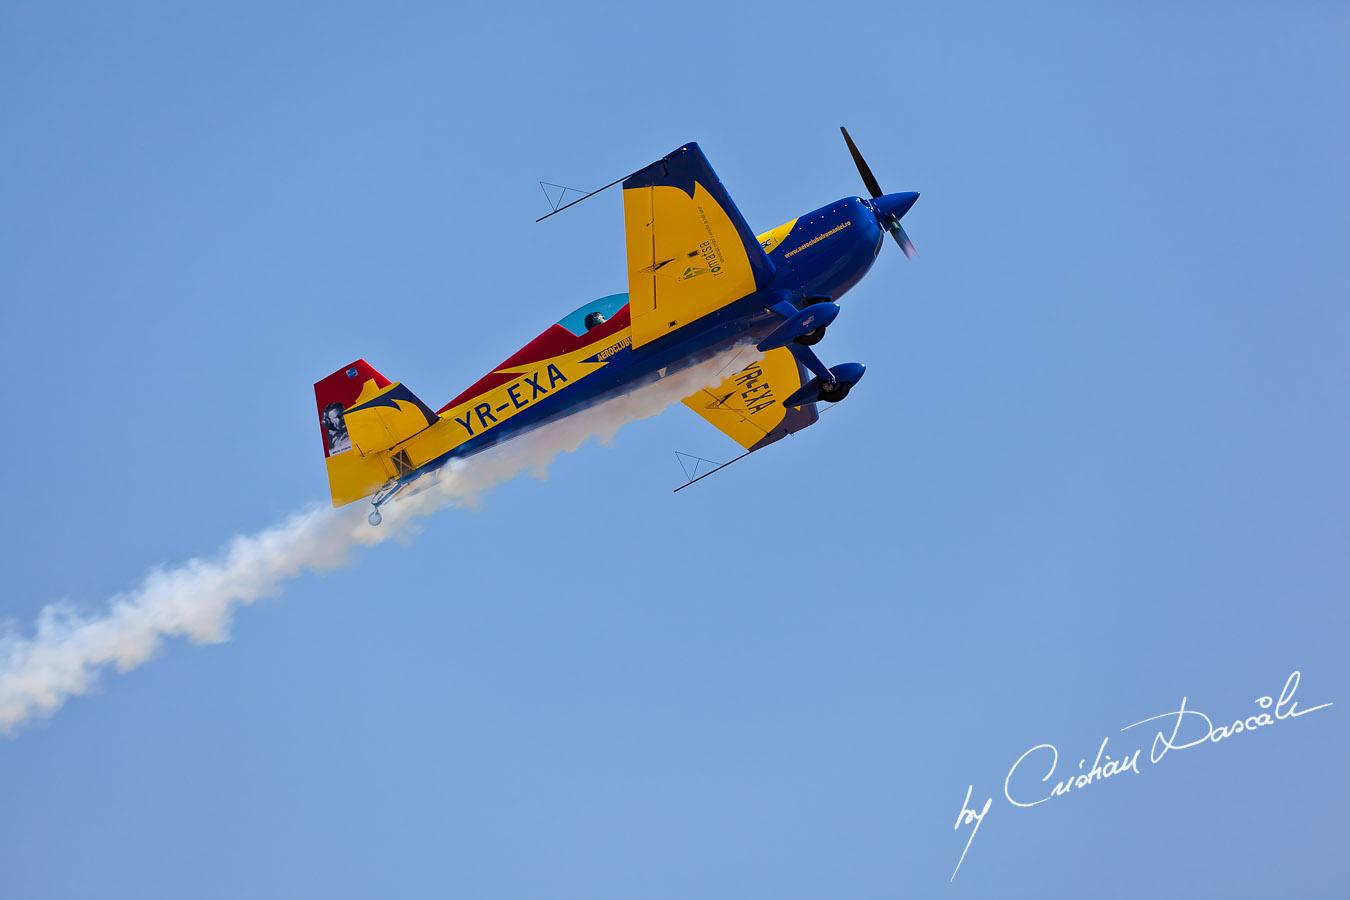 Suceava Air Show 2012 - Cyprus Photographer: Cristian Dascalu